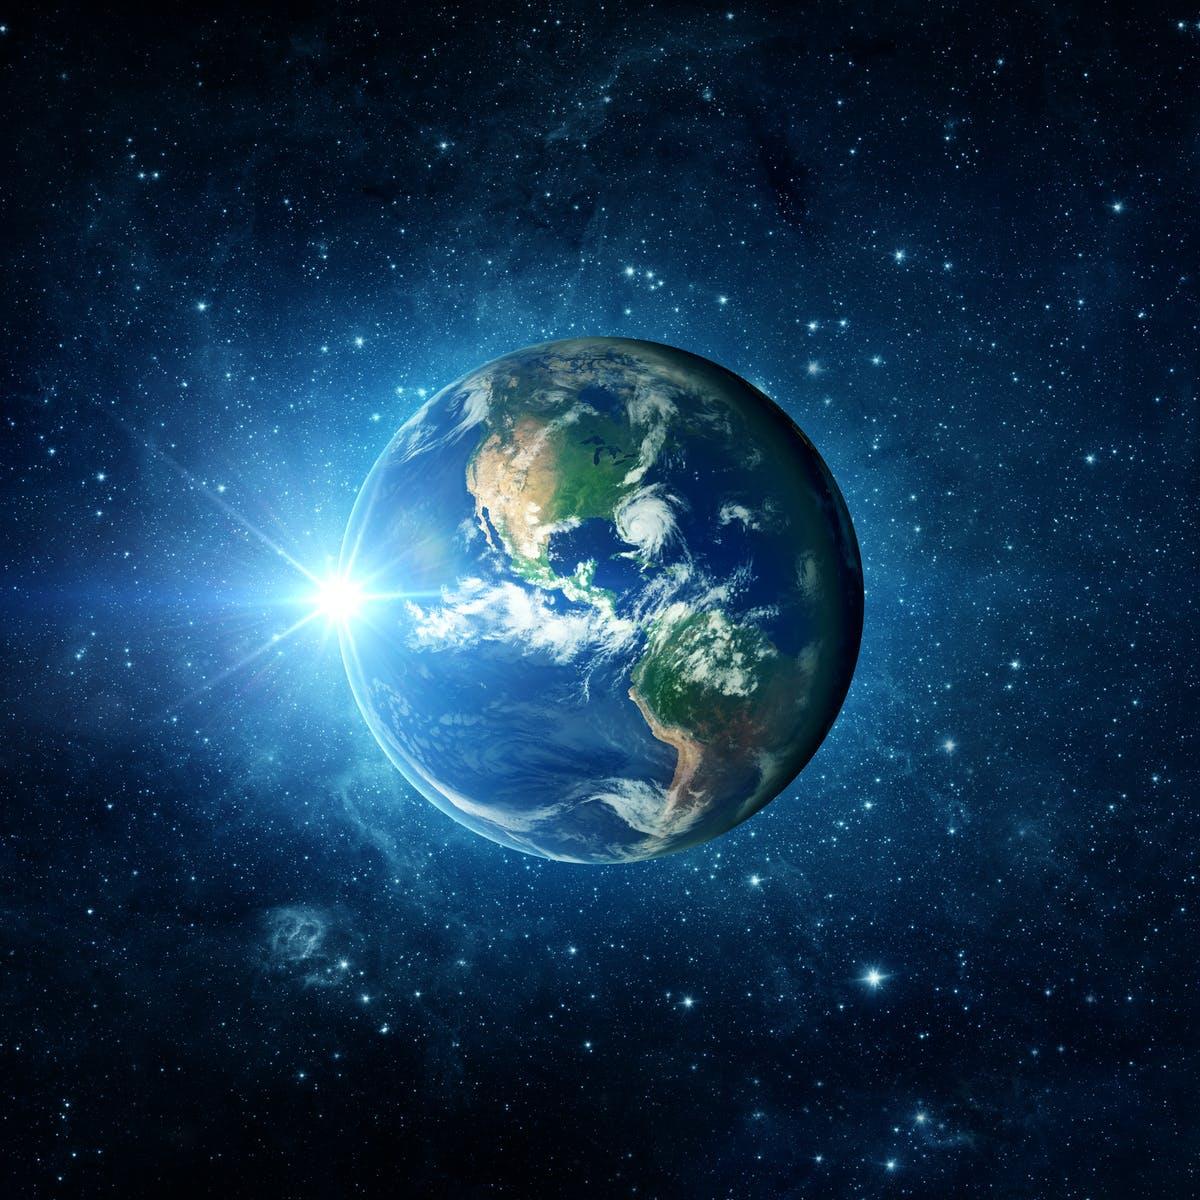 #earth#love#light#dark#lightvsdark#good#spiritual#life#shifting